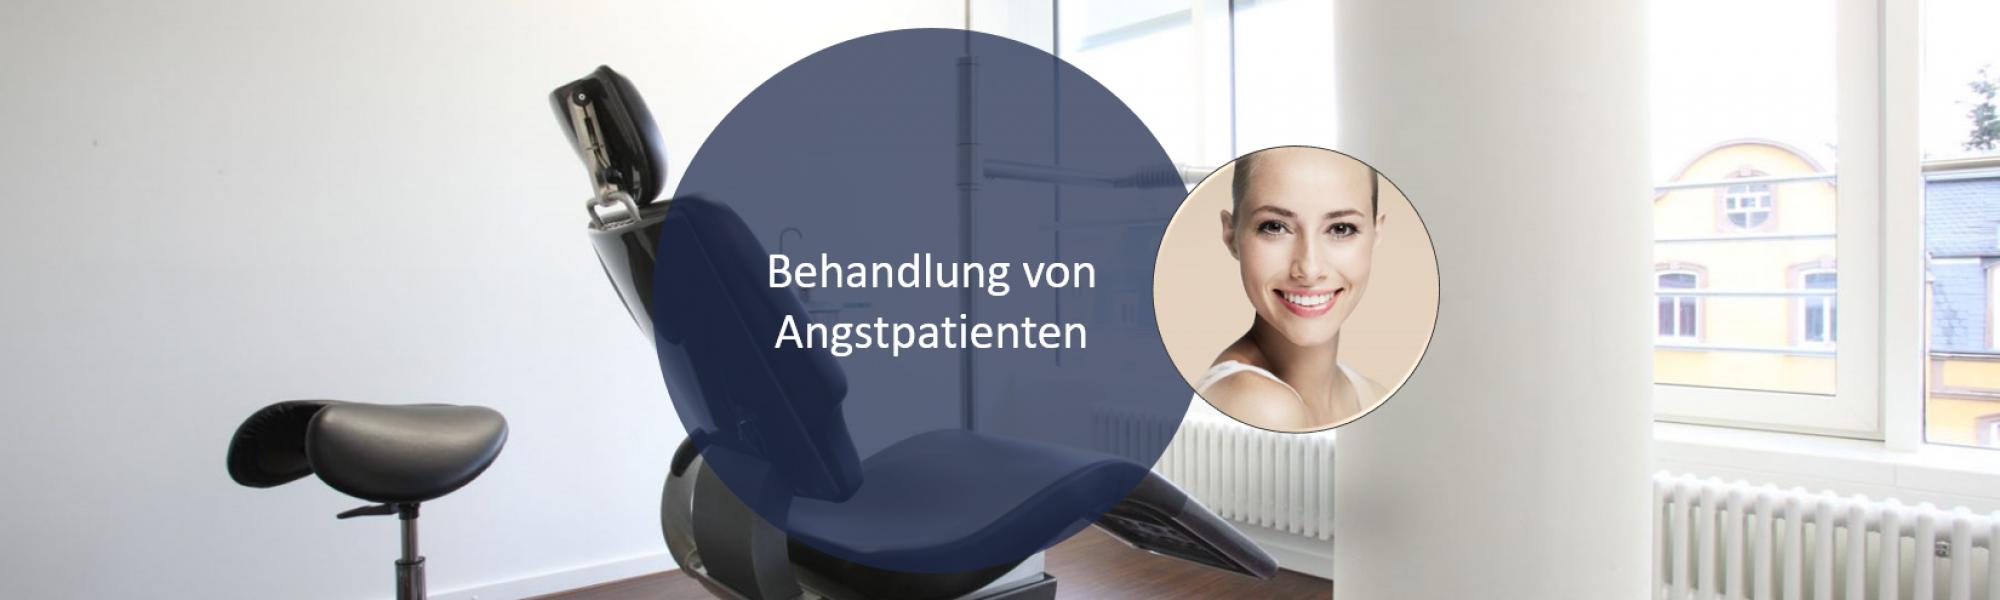 Angstpatienten bei Groisman & Laube in Frankfurt behandeln